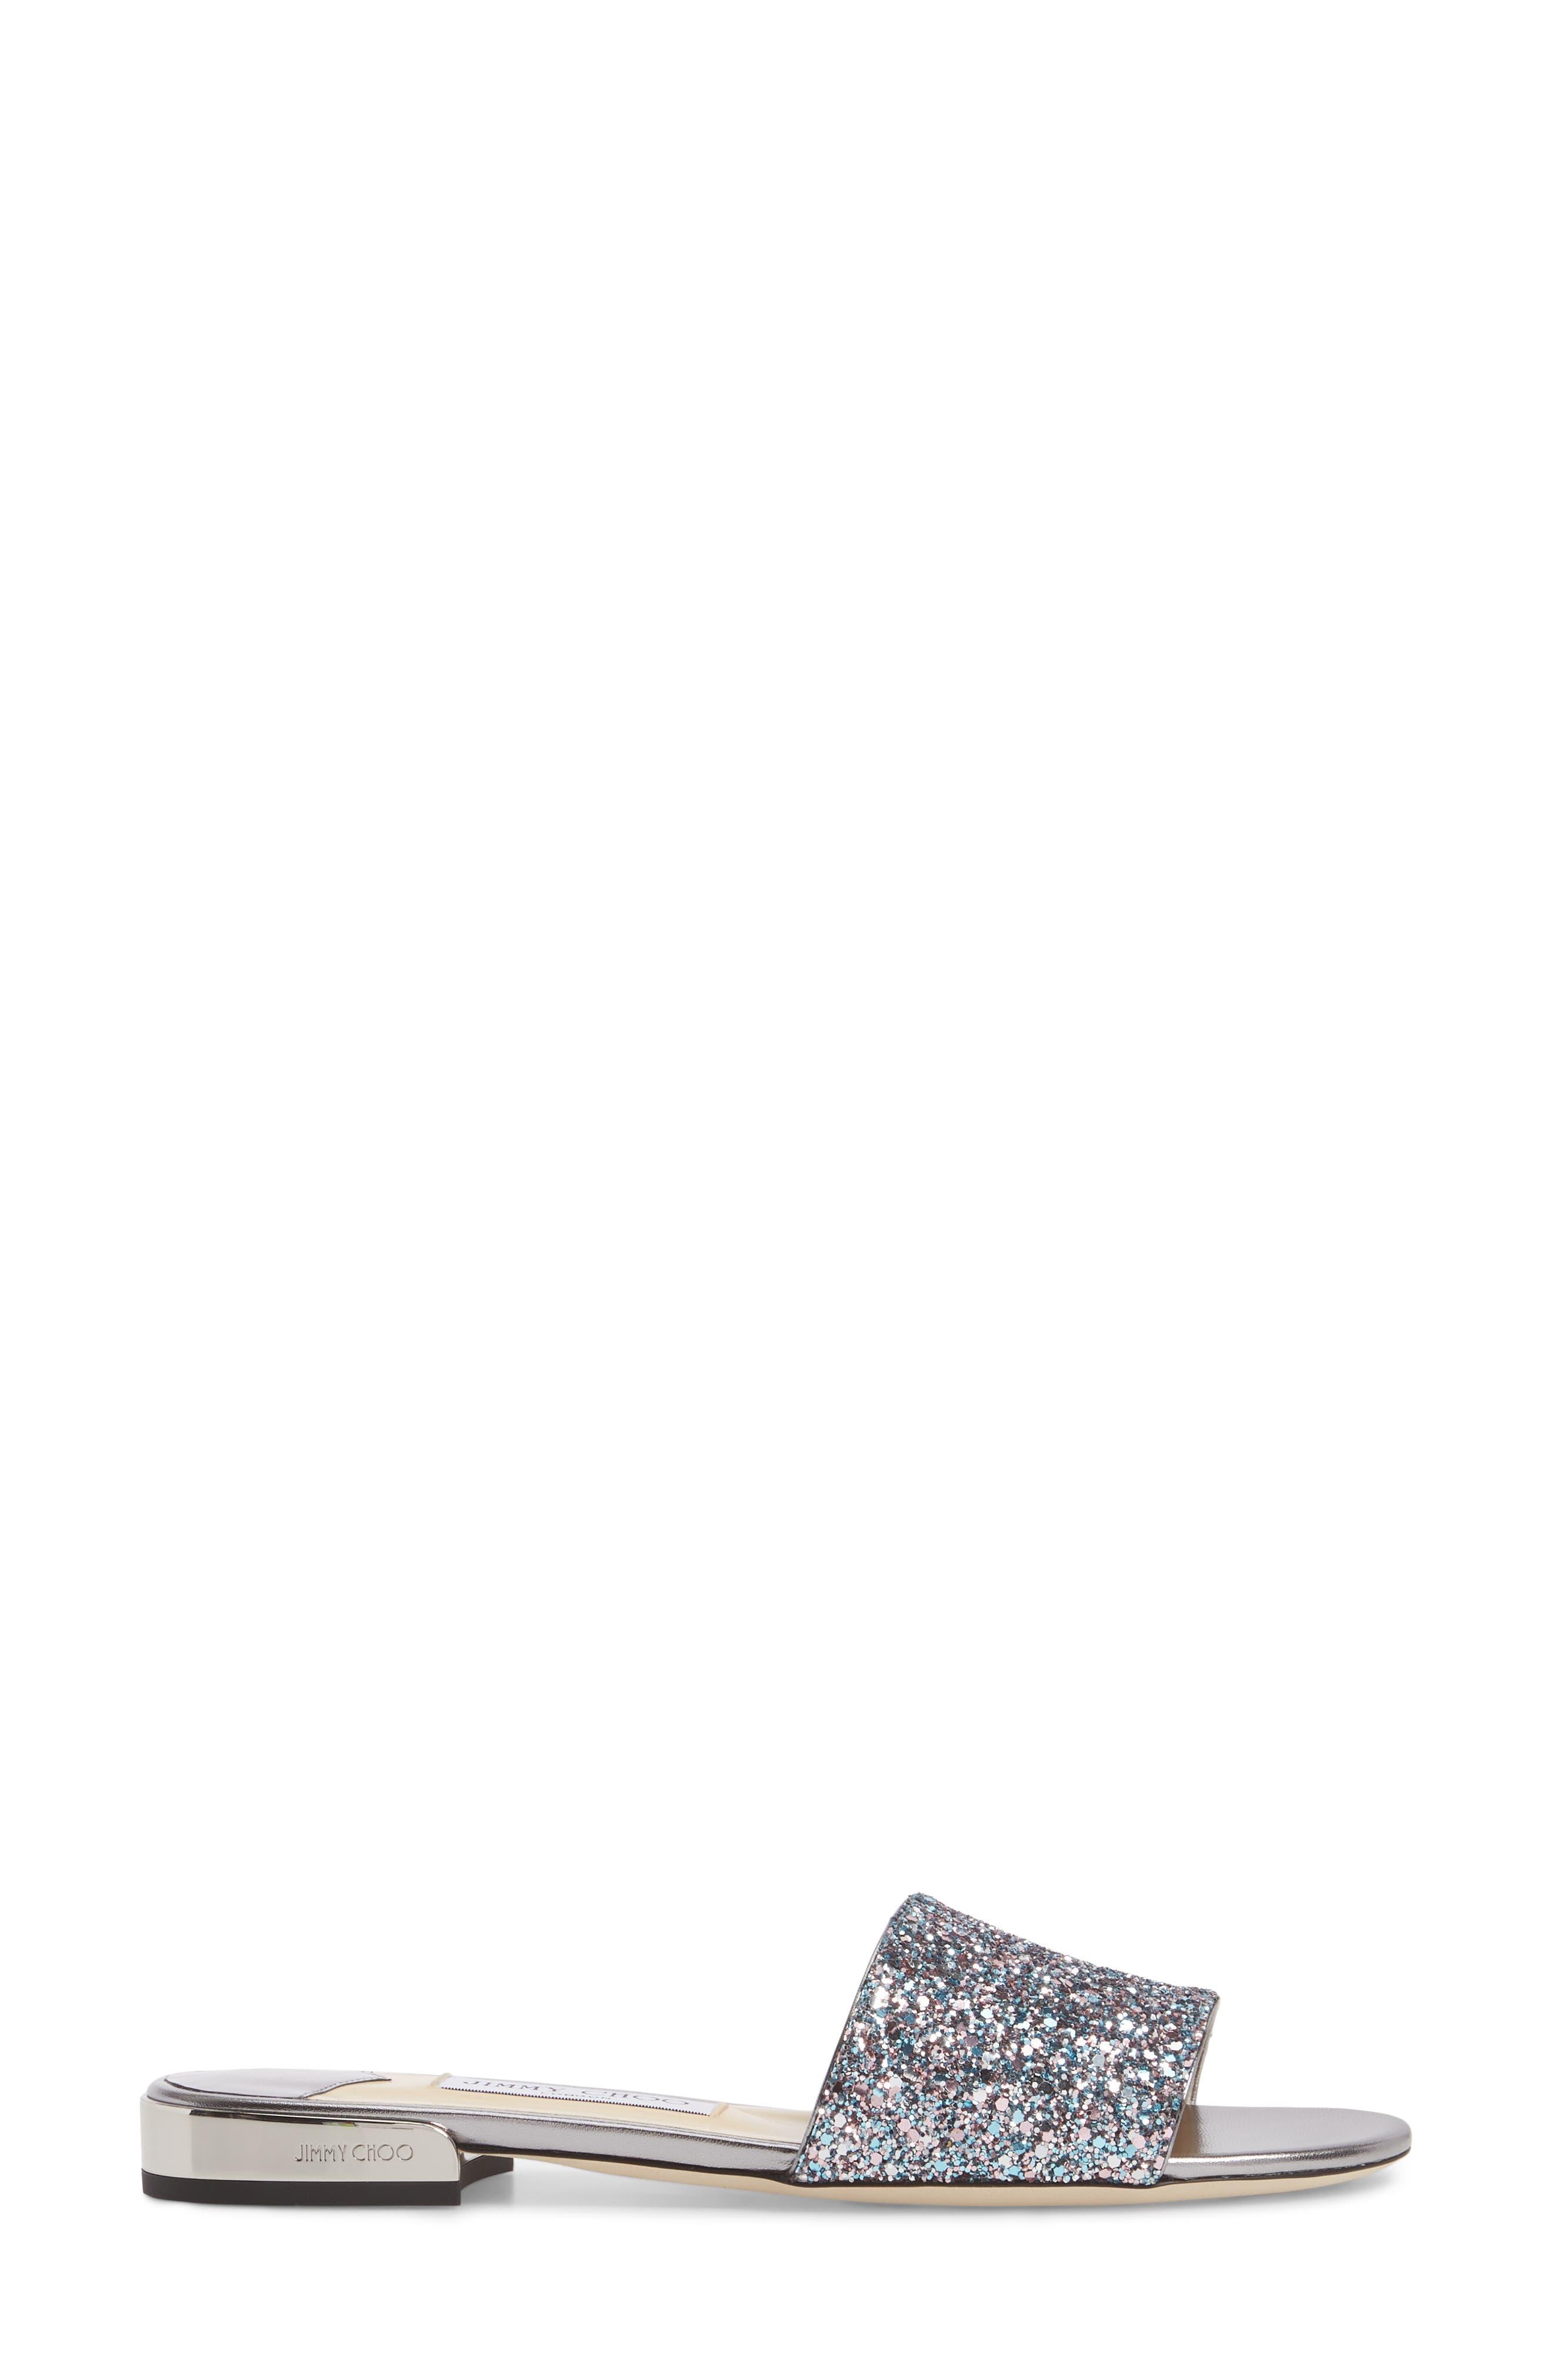 Joni Embellished Slide Sandal,                             Alternate thumbnail 3, color,                             Blush Silver